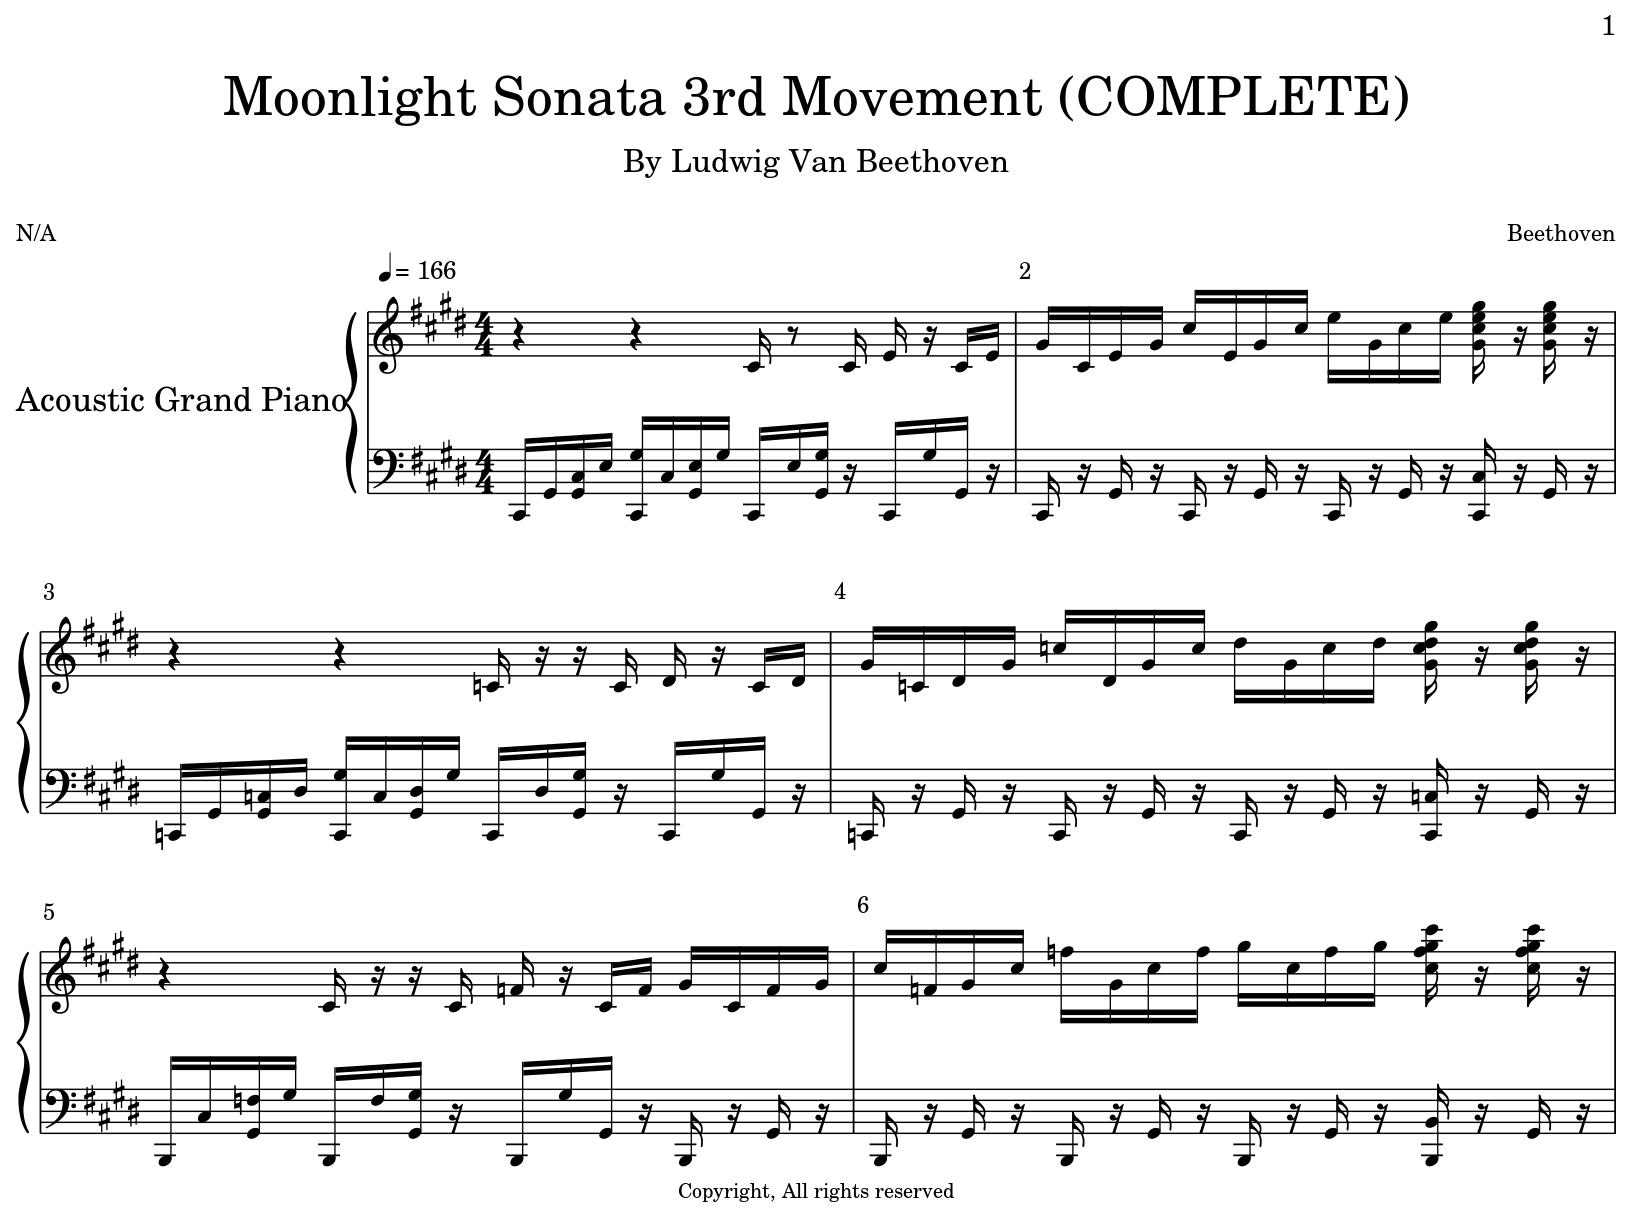 Moonlight Sonata 3rd Movement (COMPLETE) - Flat